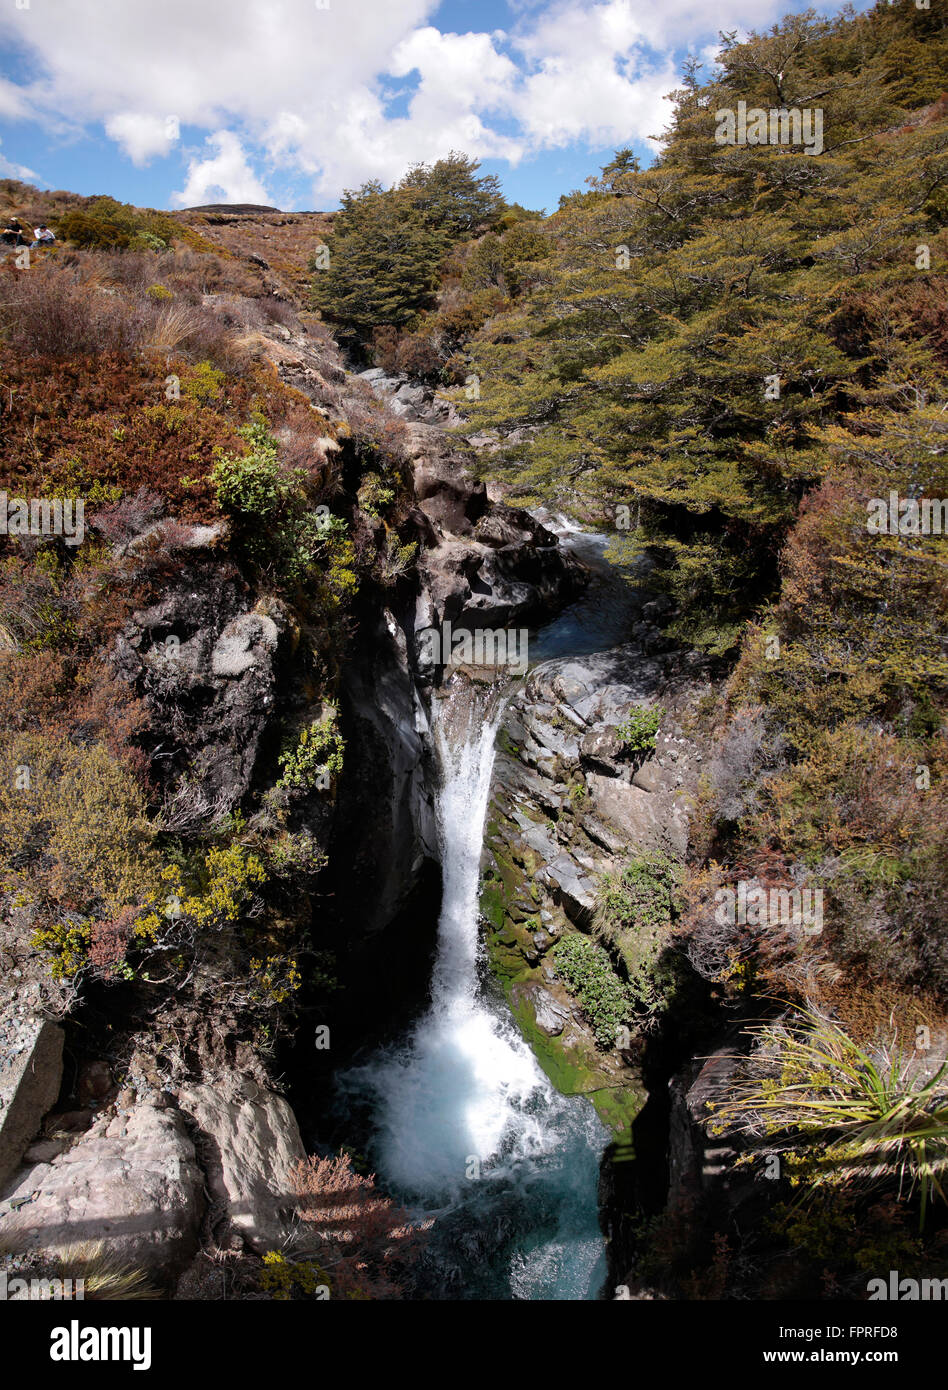 Waterfall in Tongariro National Park, Manawatu-Wanganui, New Zealand - Stock Image